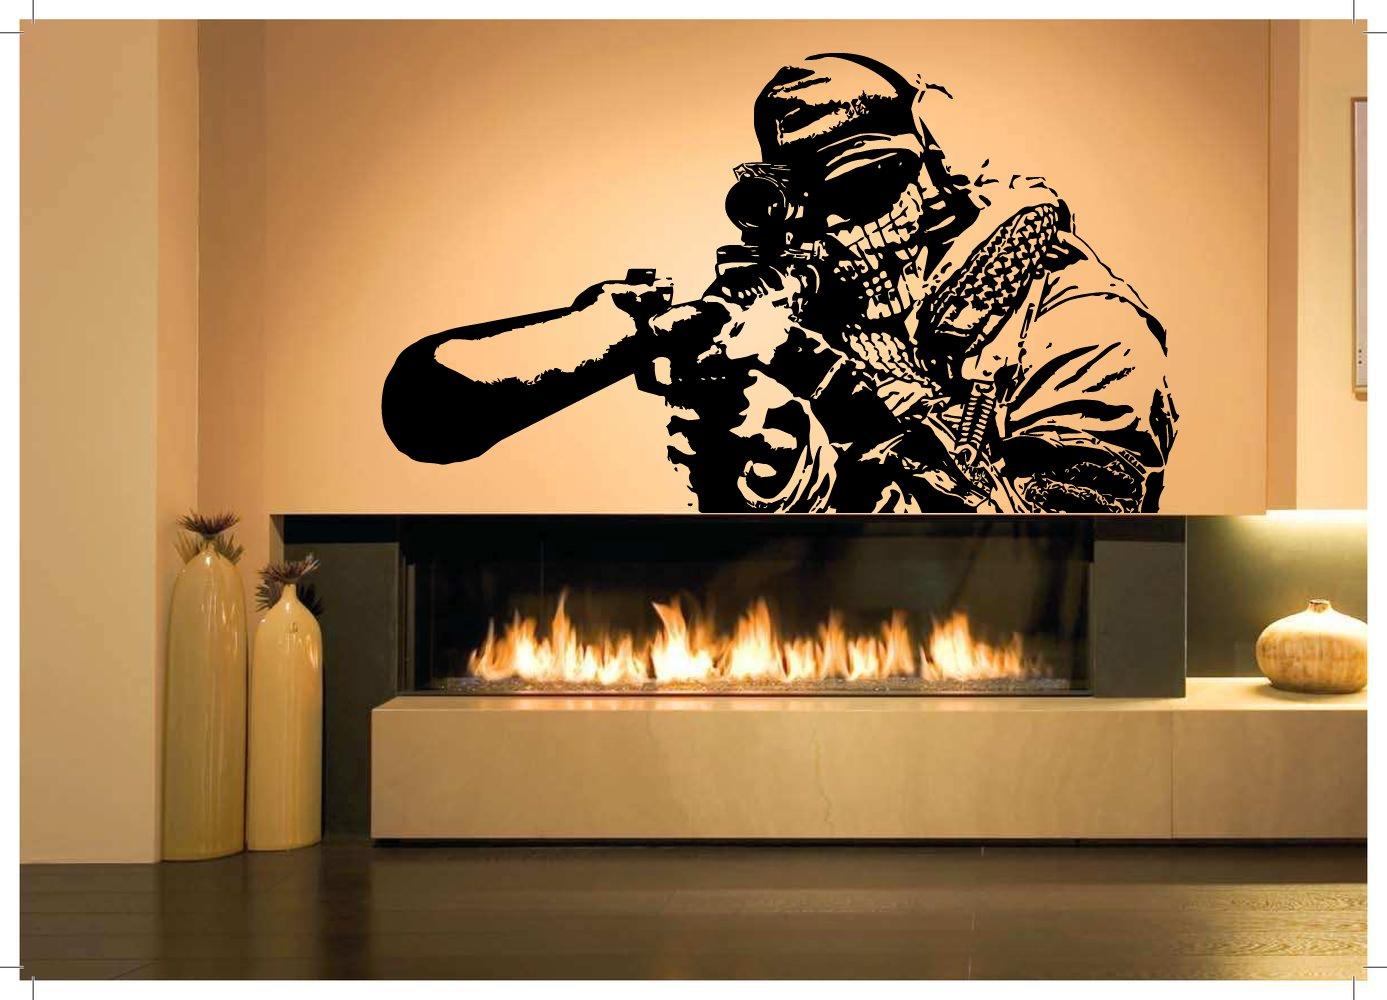 Wall Vinyl Sticker OPS Soldier Shooter Max 76% OFF Fighter Sniper Room Decor Genuine